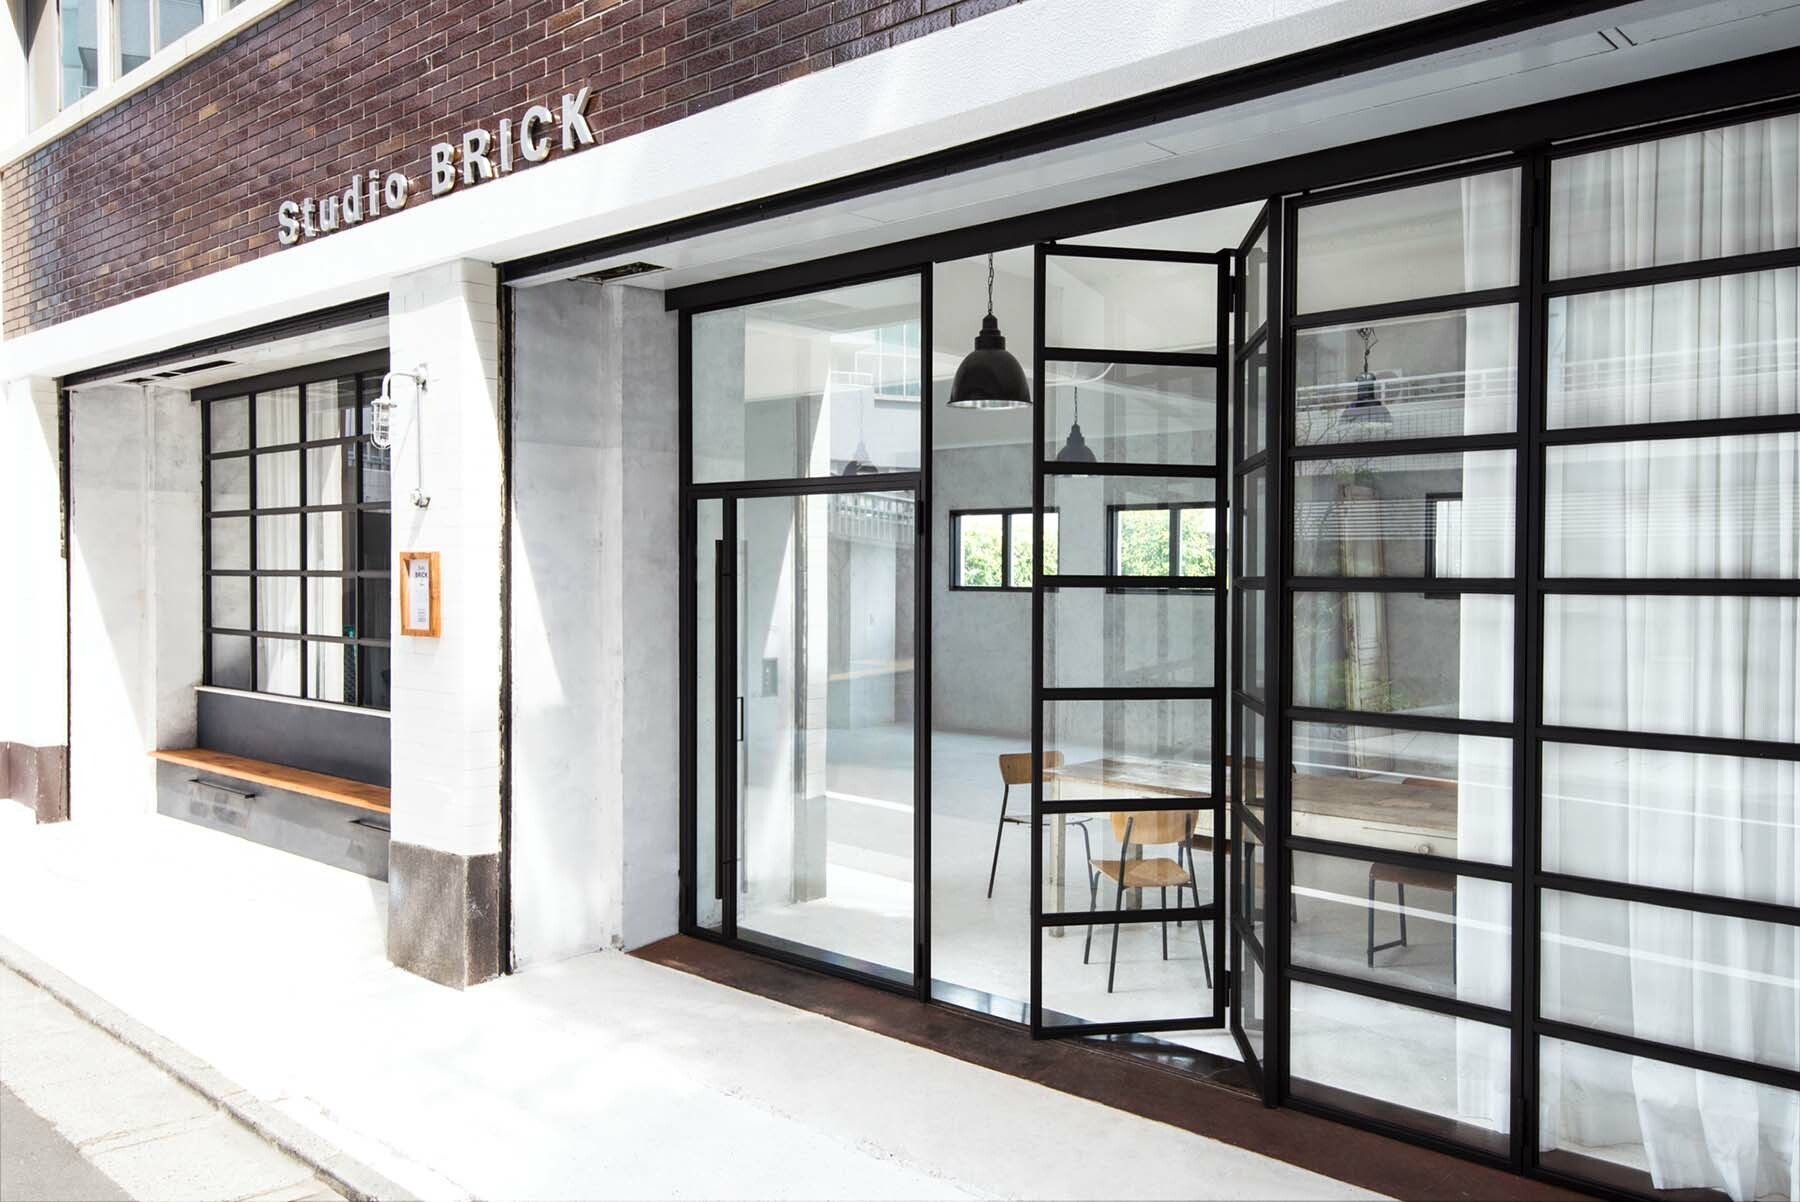 StudioBRICK 1F (スタジオブリック八丁堀1F)扉は開閉可能